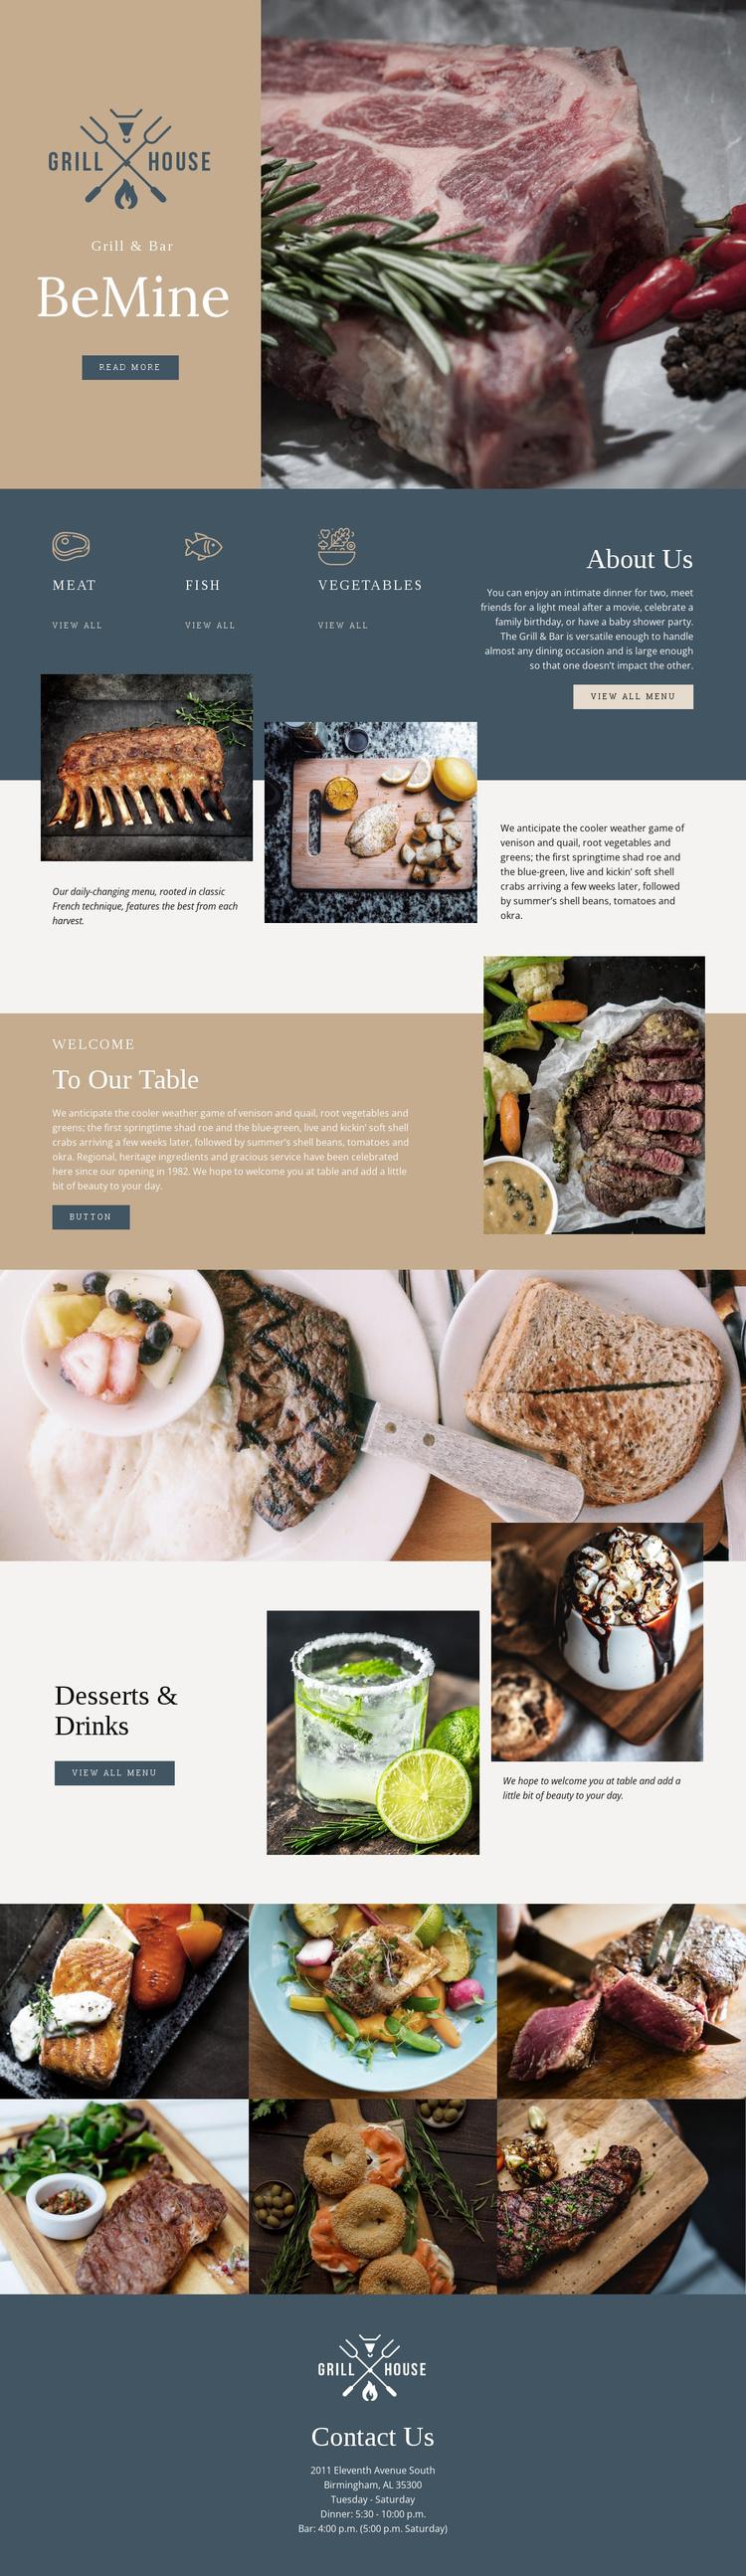 Finest grill house restaurant Joomla Template